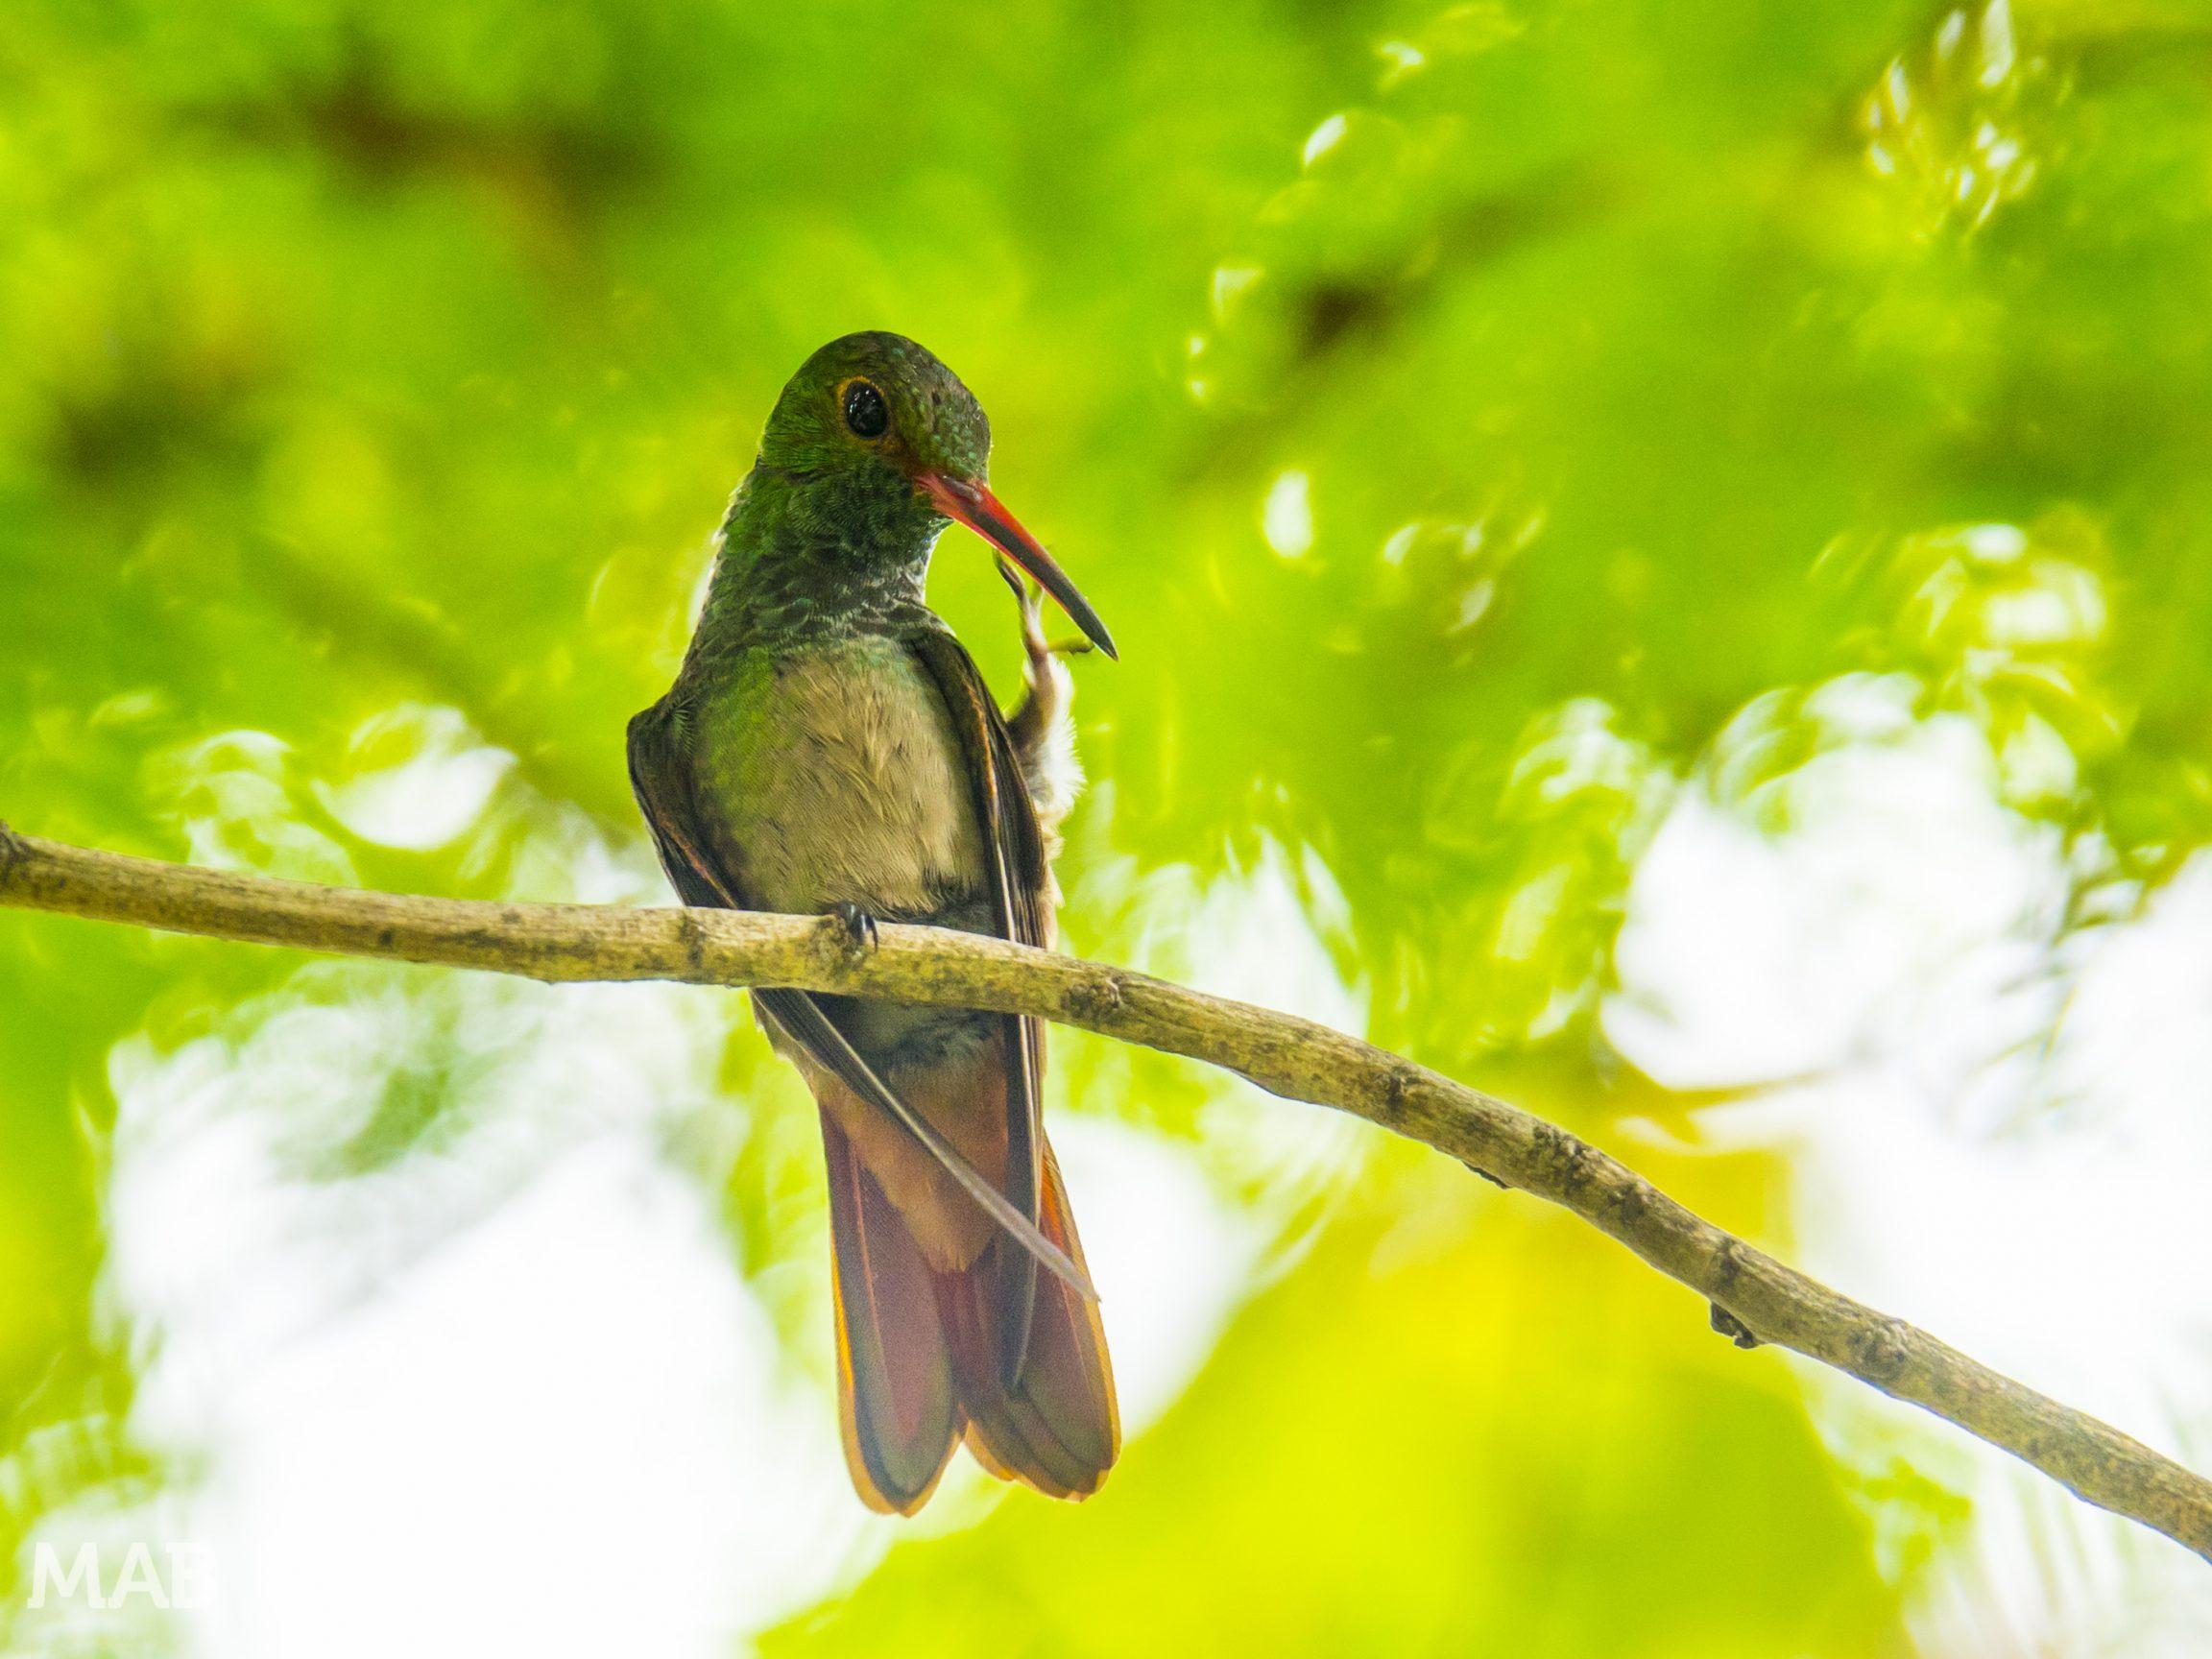 Hummingbird In The City